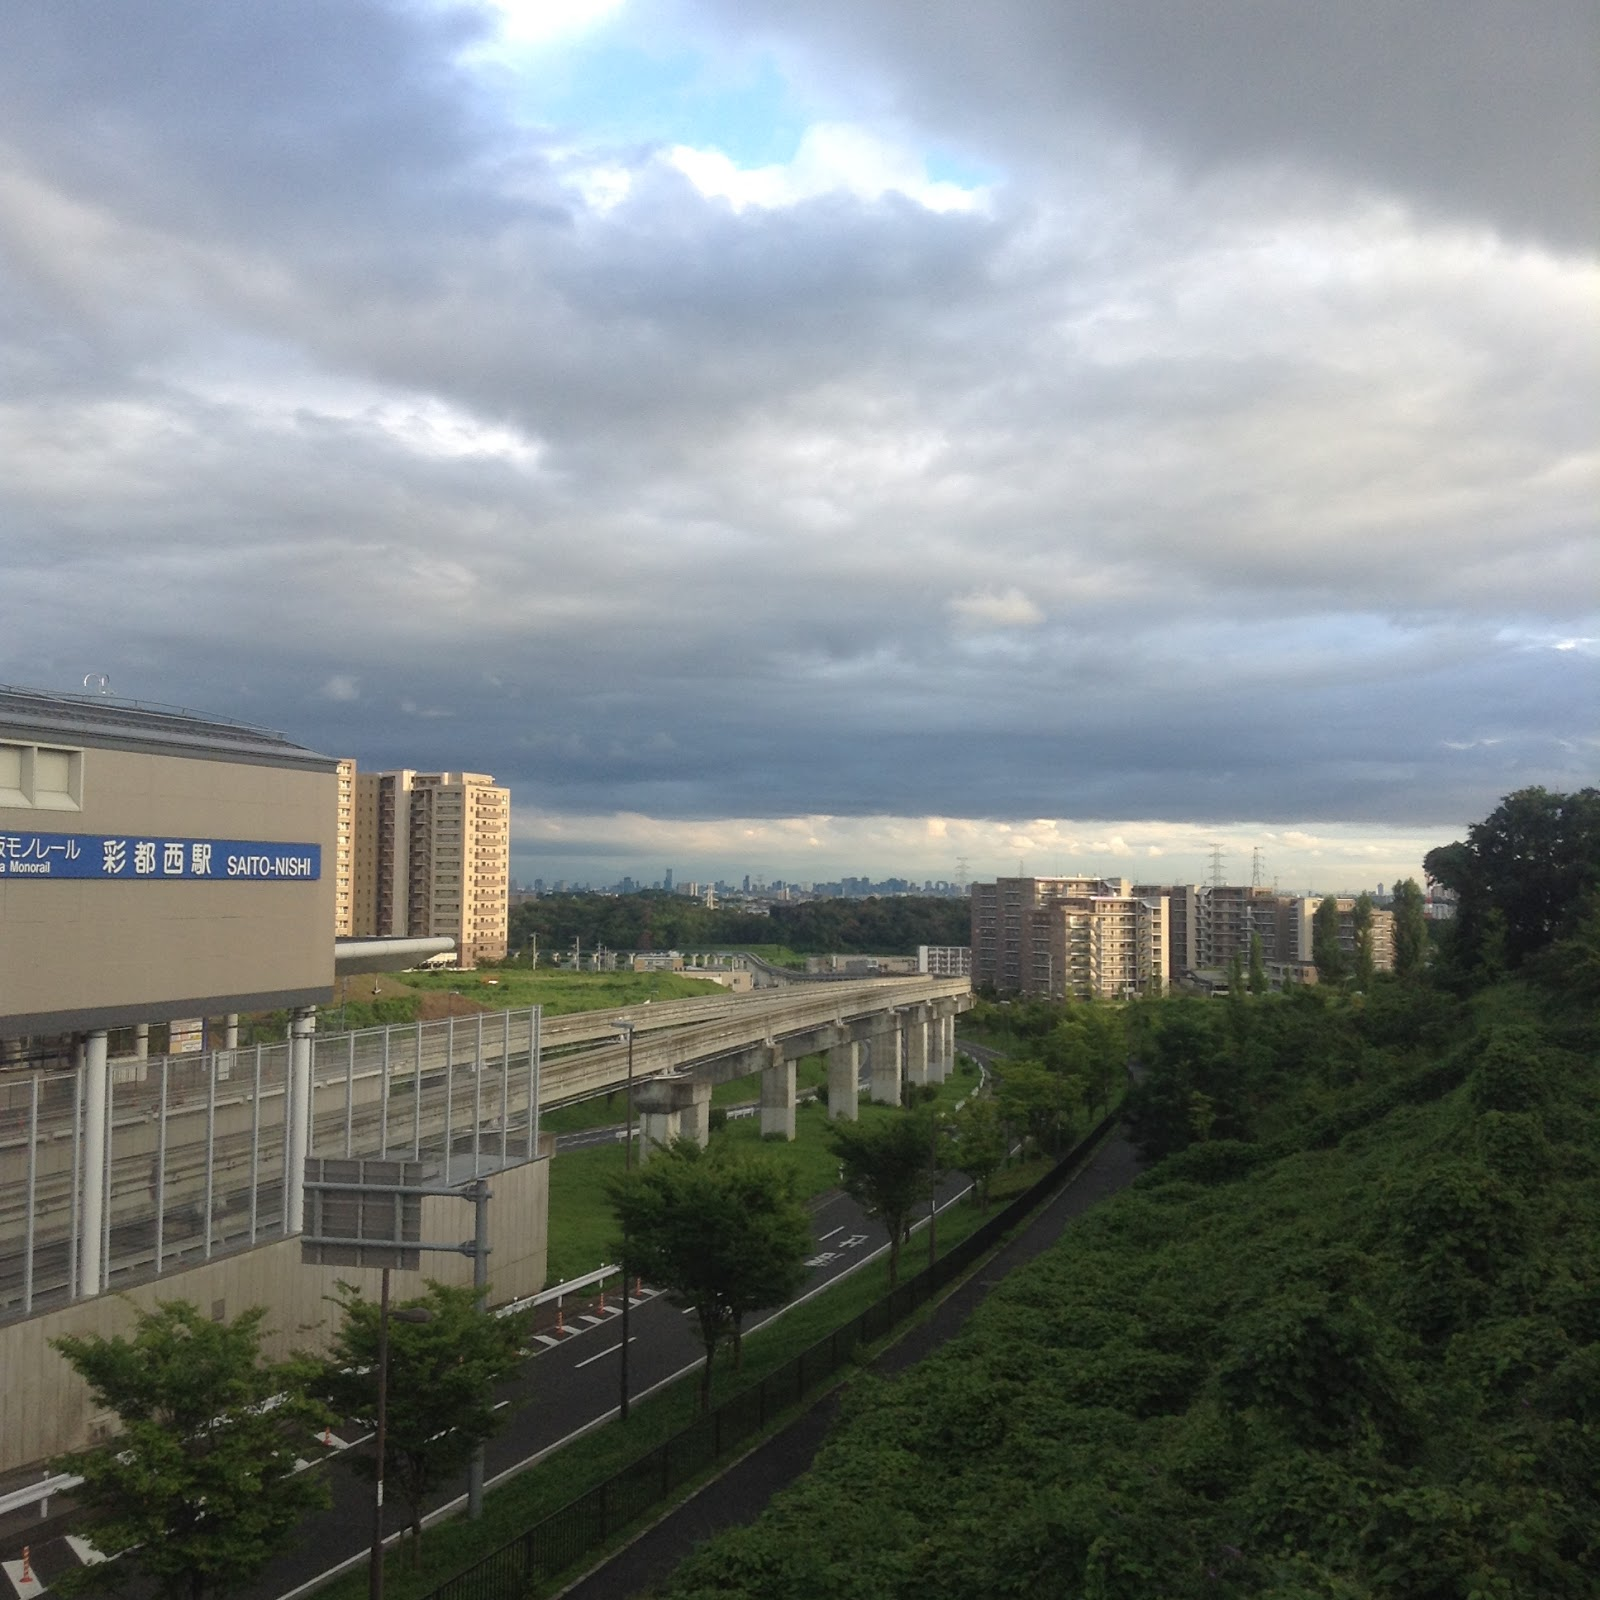 Osaka monorail Japanese suburbs